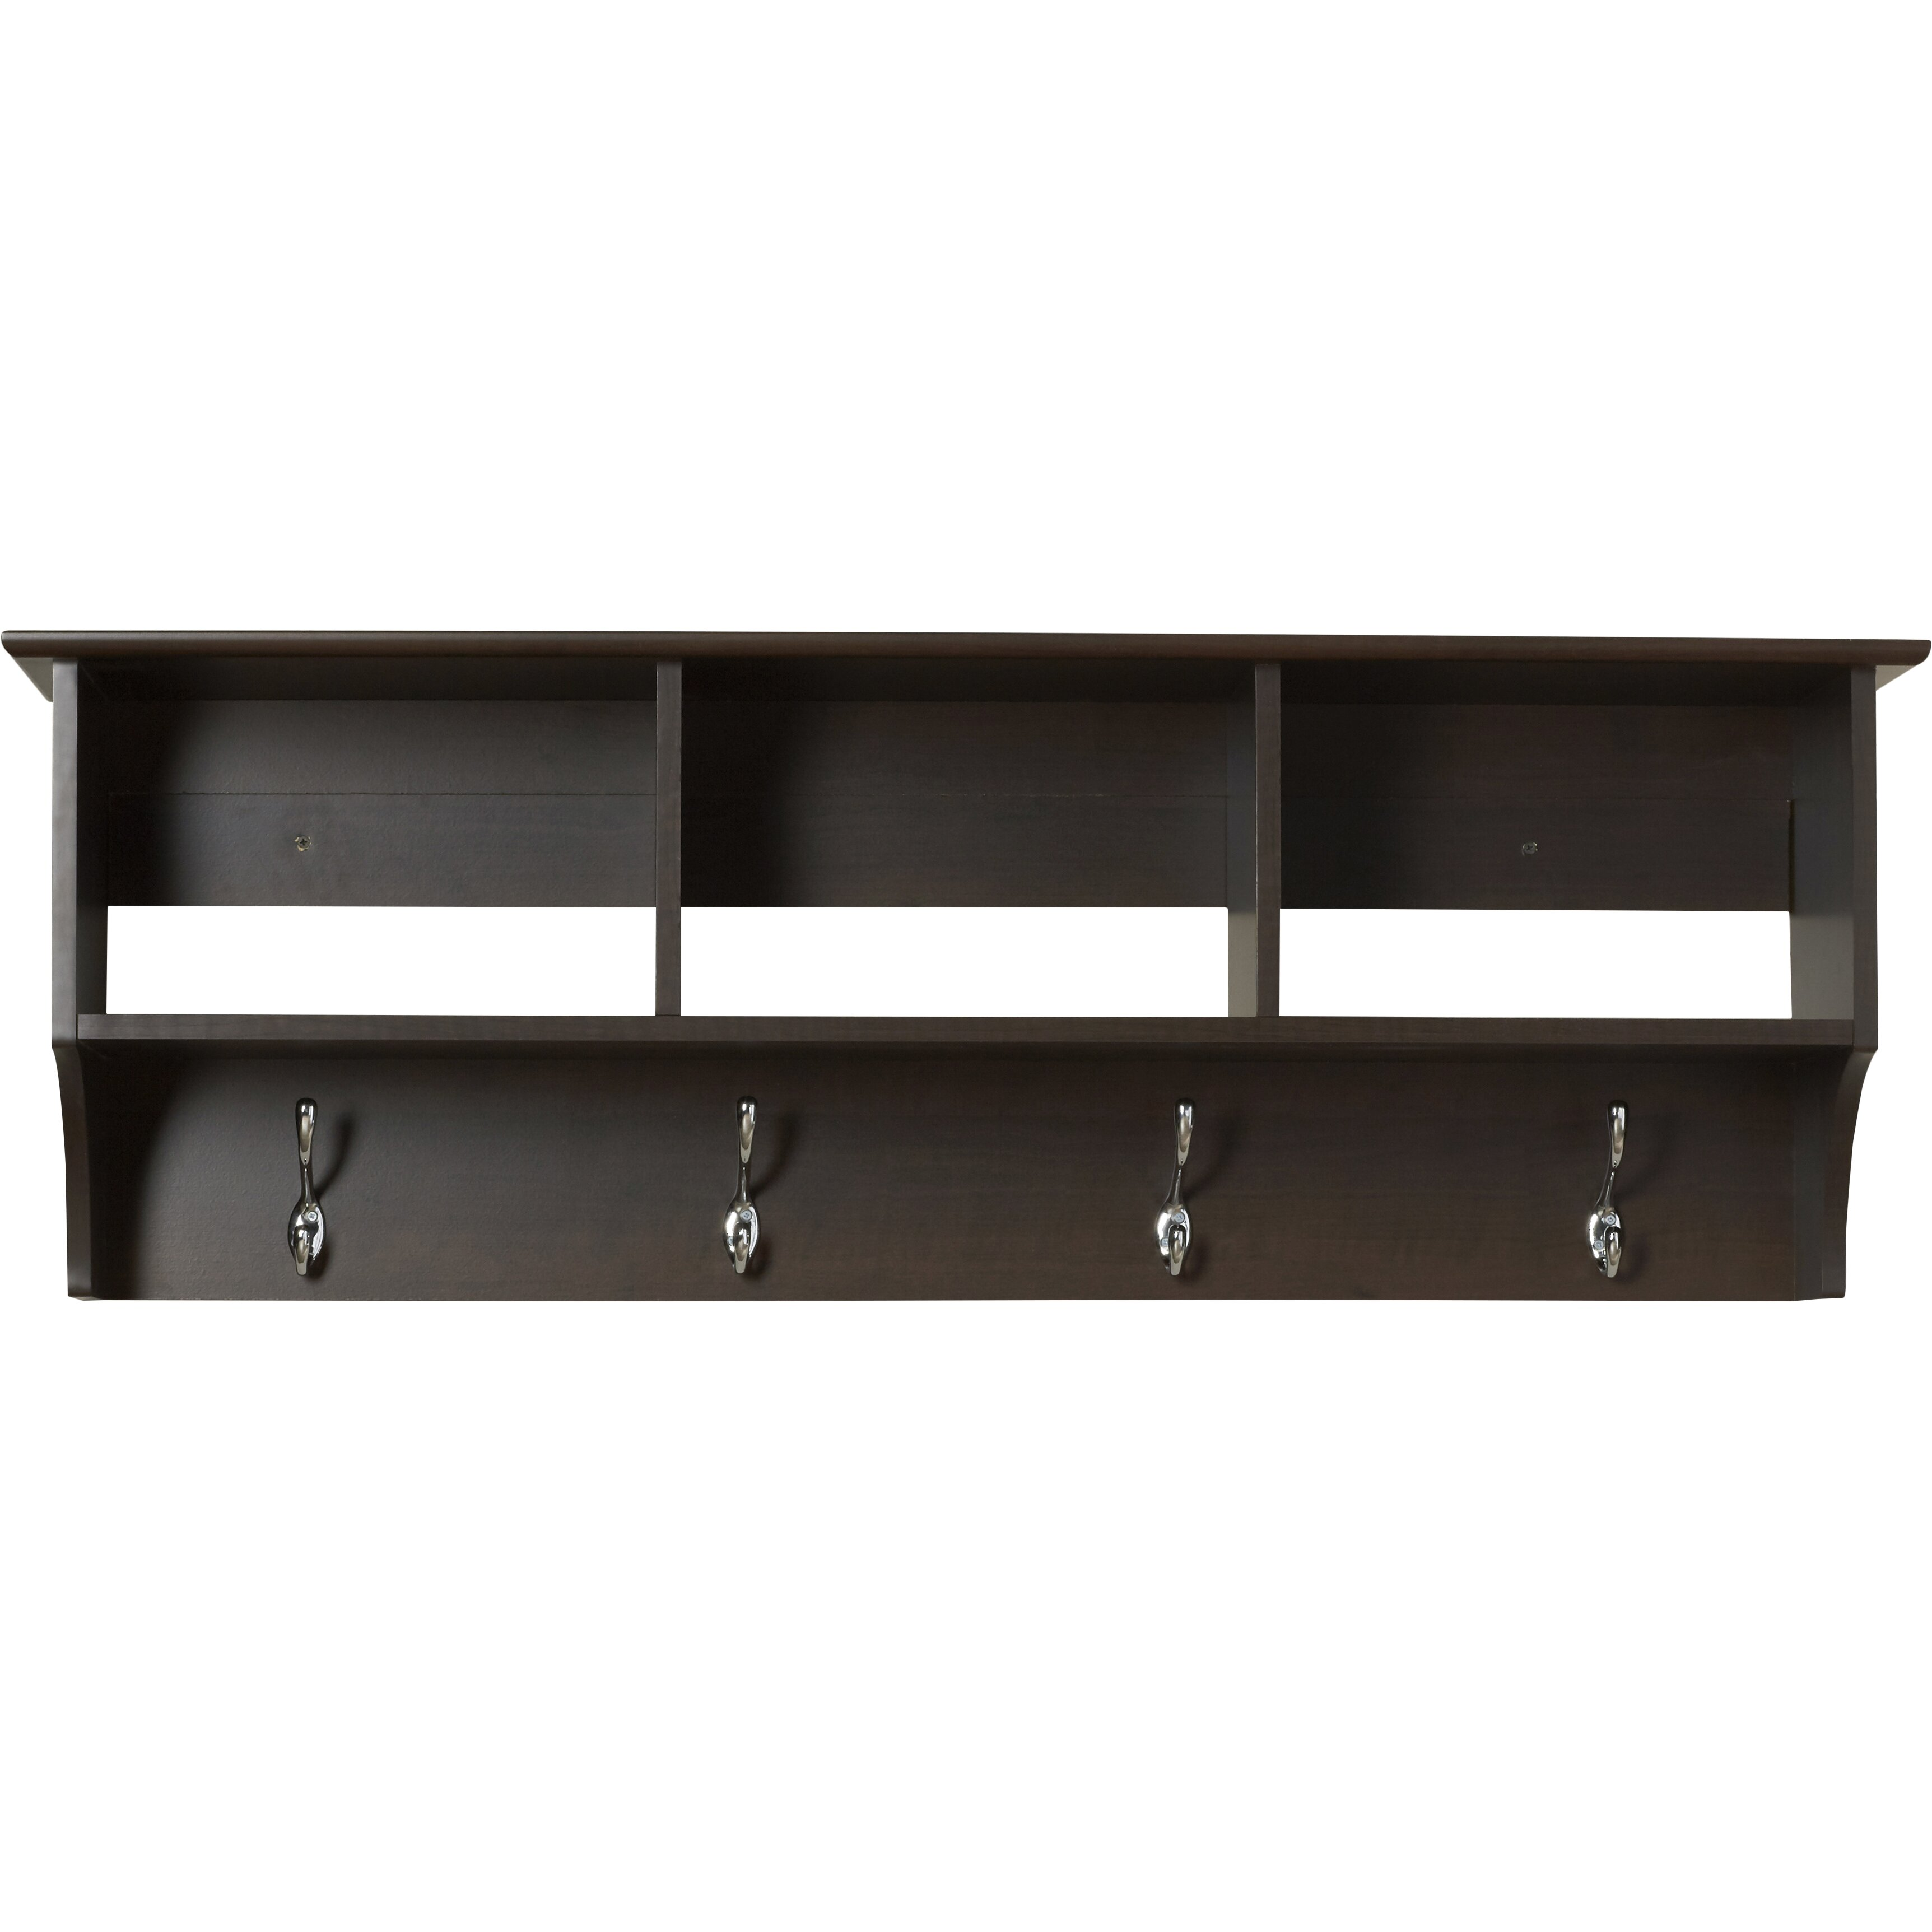 andover mills wall mounted coat rack reviews wayfair supply. Black Bedroom Furniture Sets. Home Design Ideas